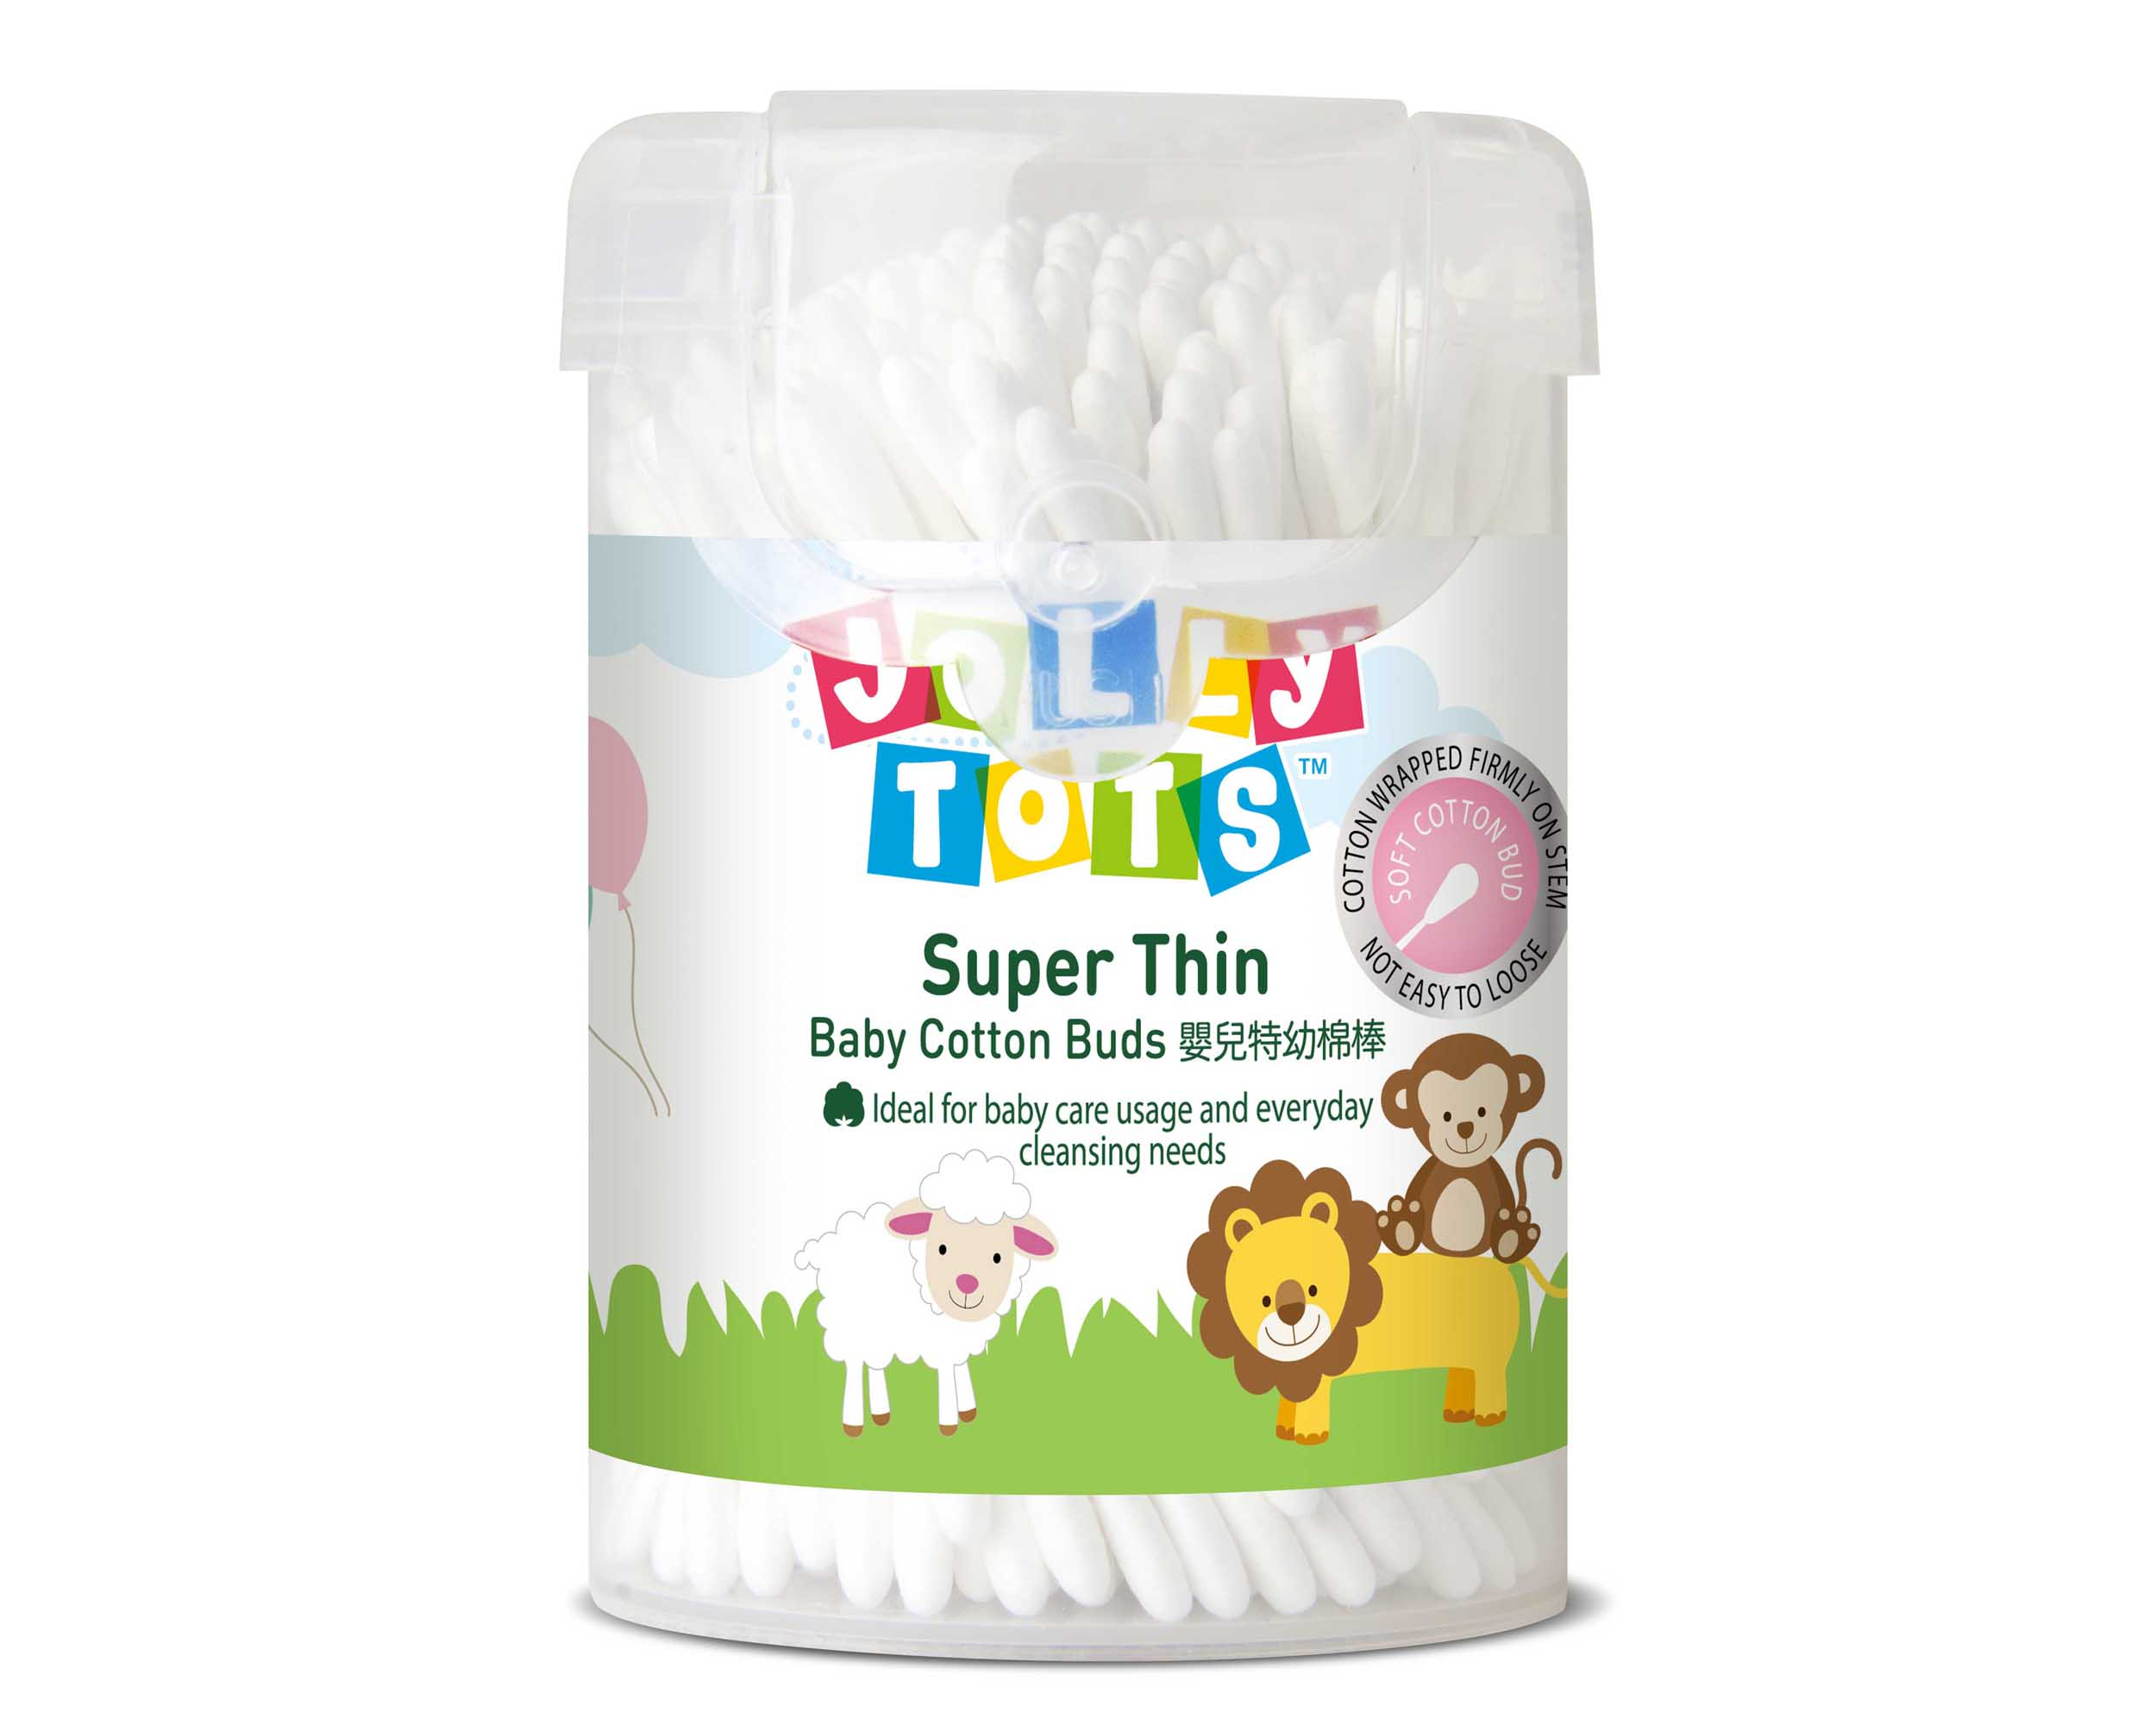 Super Thin Cotton Buds 200 pieces